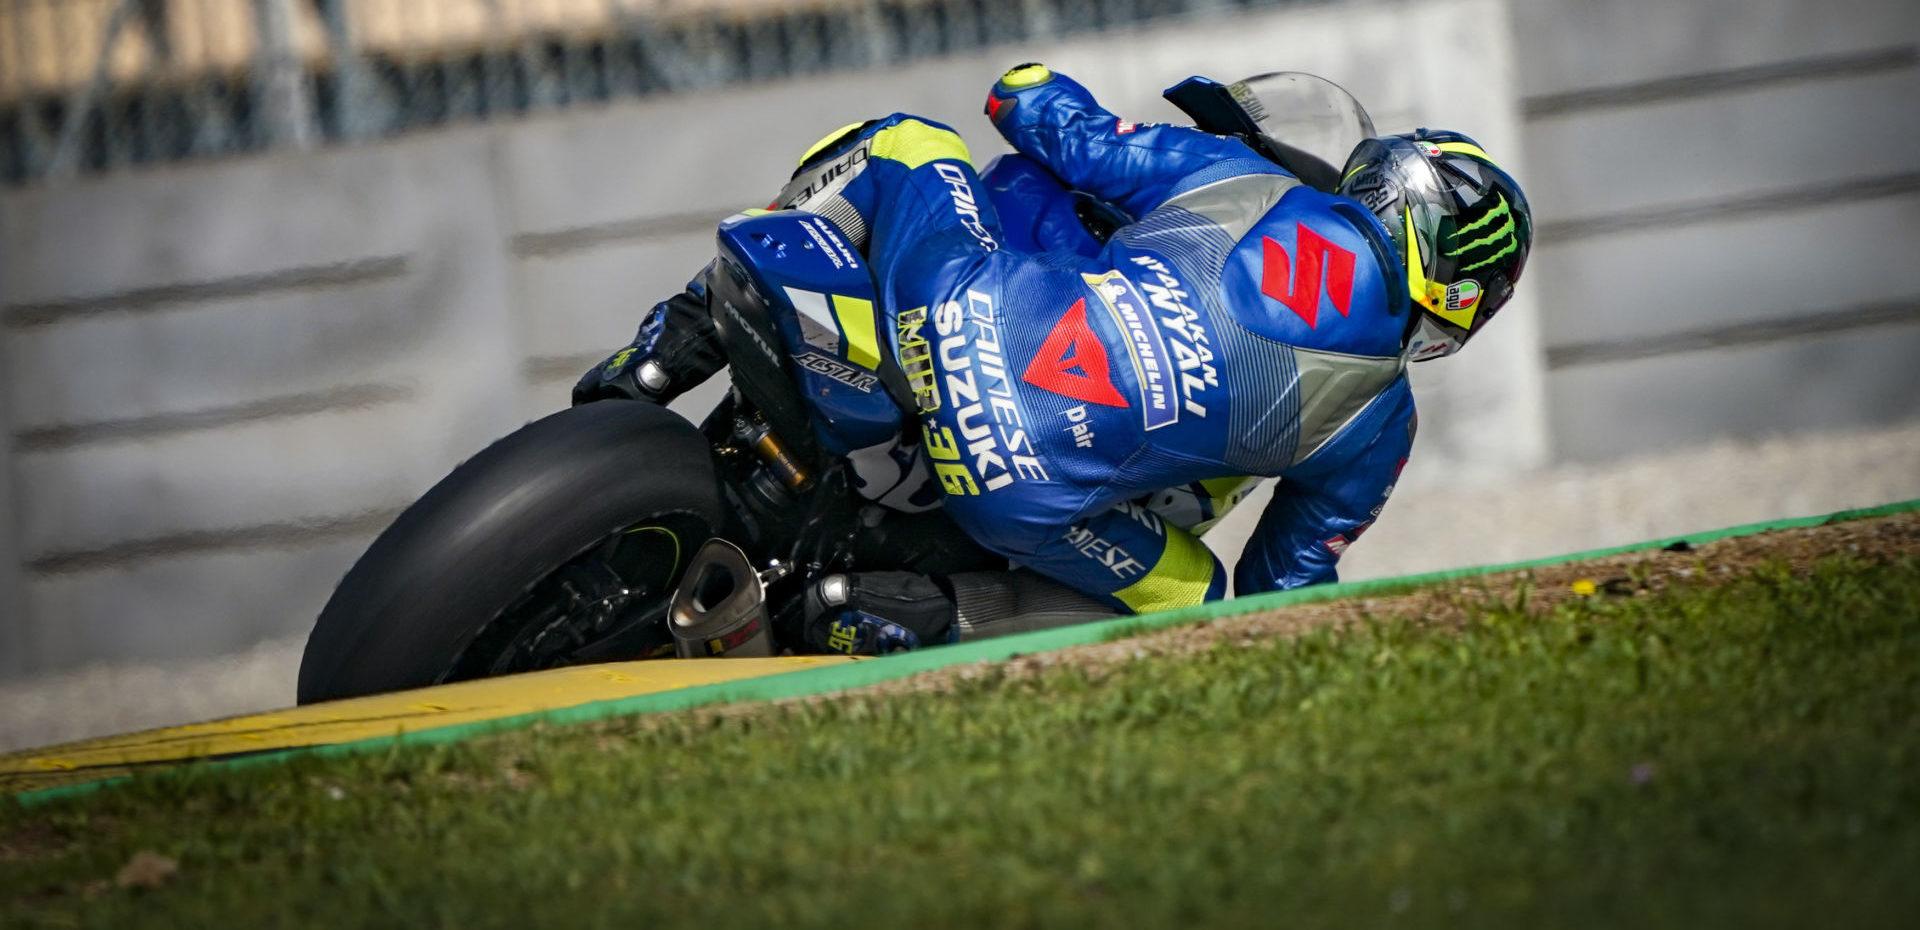 2020 MotoGP World Champion Joan Mir riding a Suzuki GSX-R1000 at Circuit de Barcelona-Catalunya. Photo courtesy Dorna.